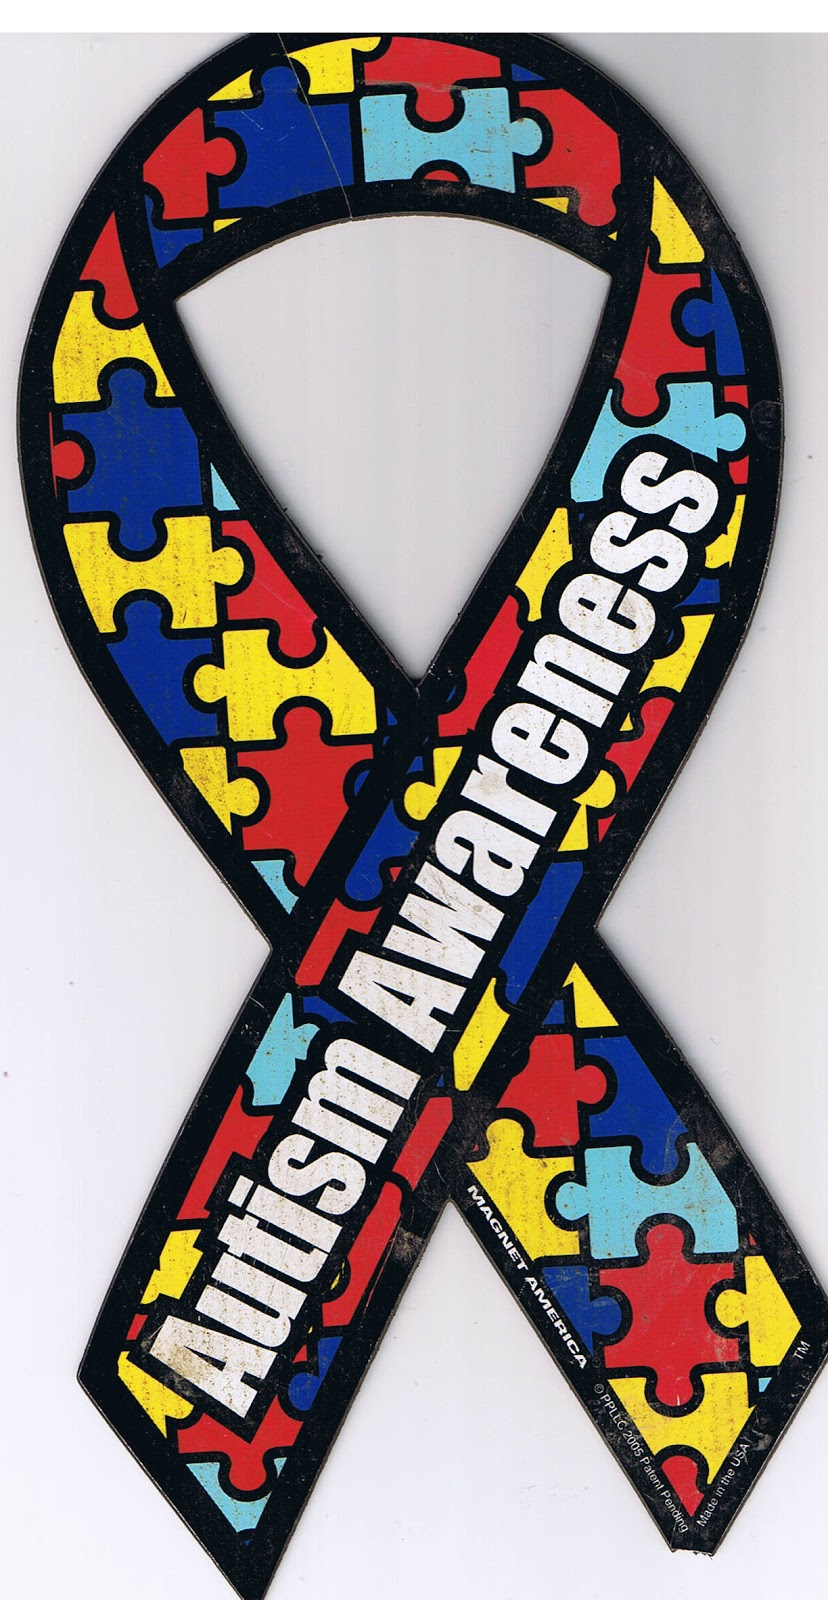 Kater's Nail Blog: World Autism Awareness Day